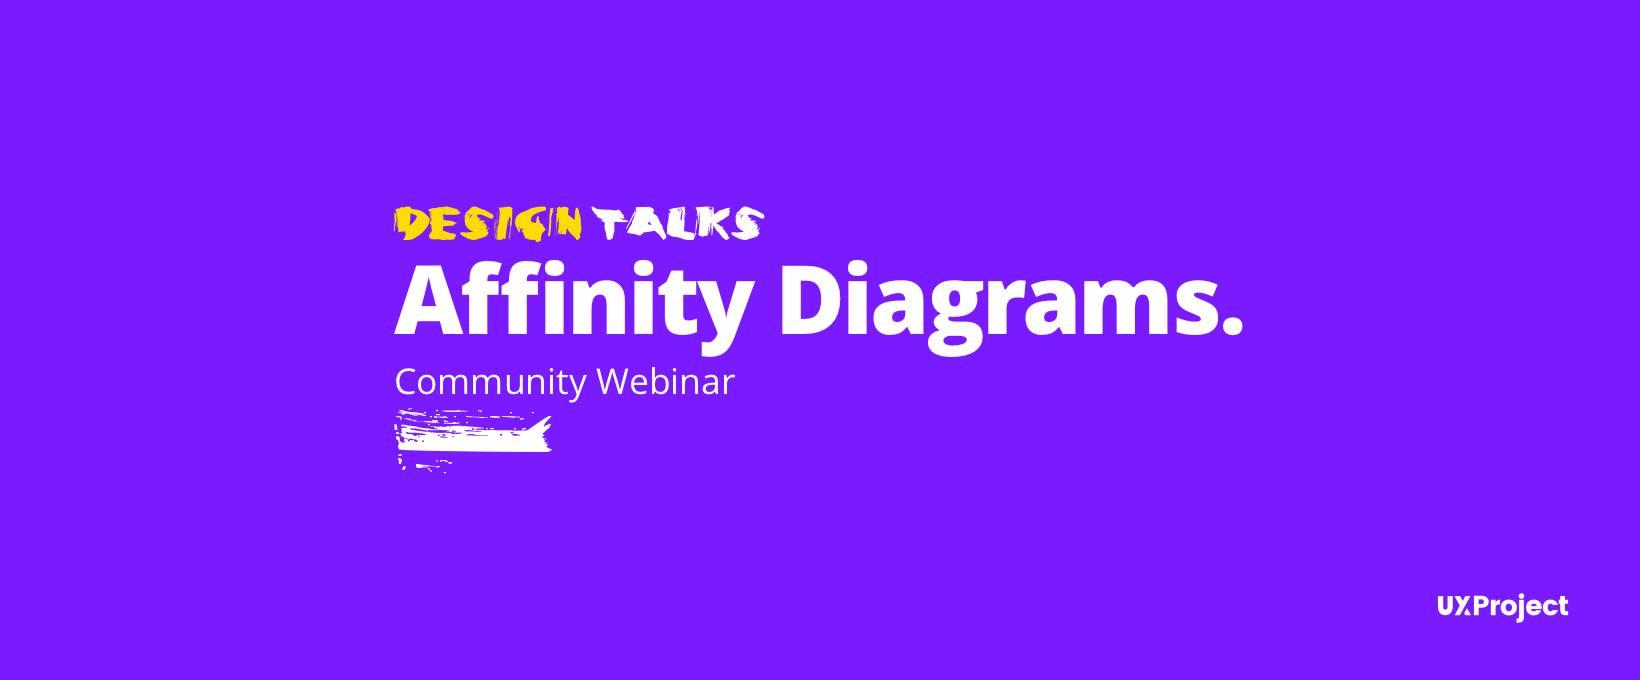 Design Talks #1 – Affinity Diagrams